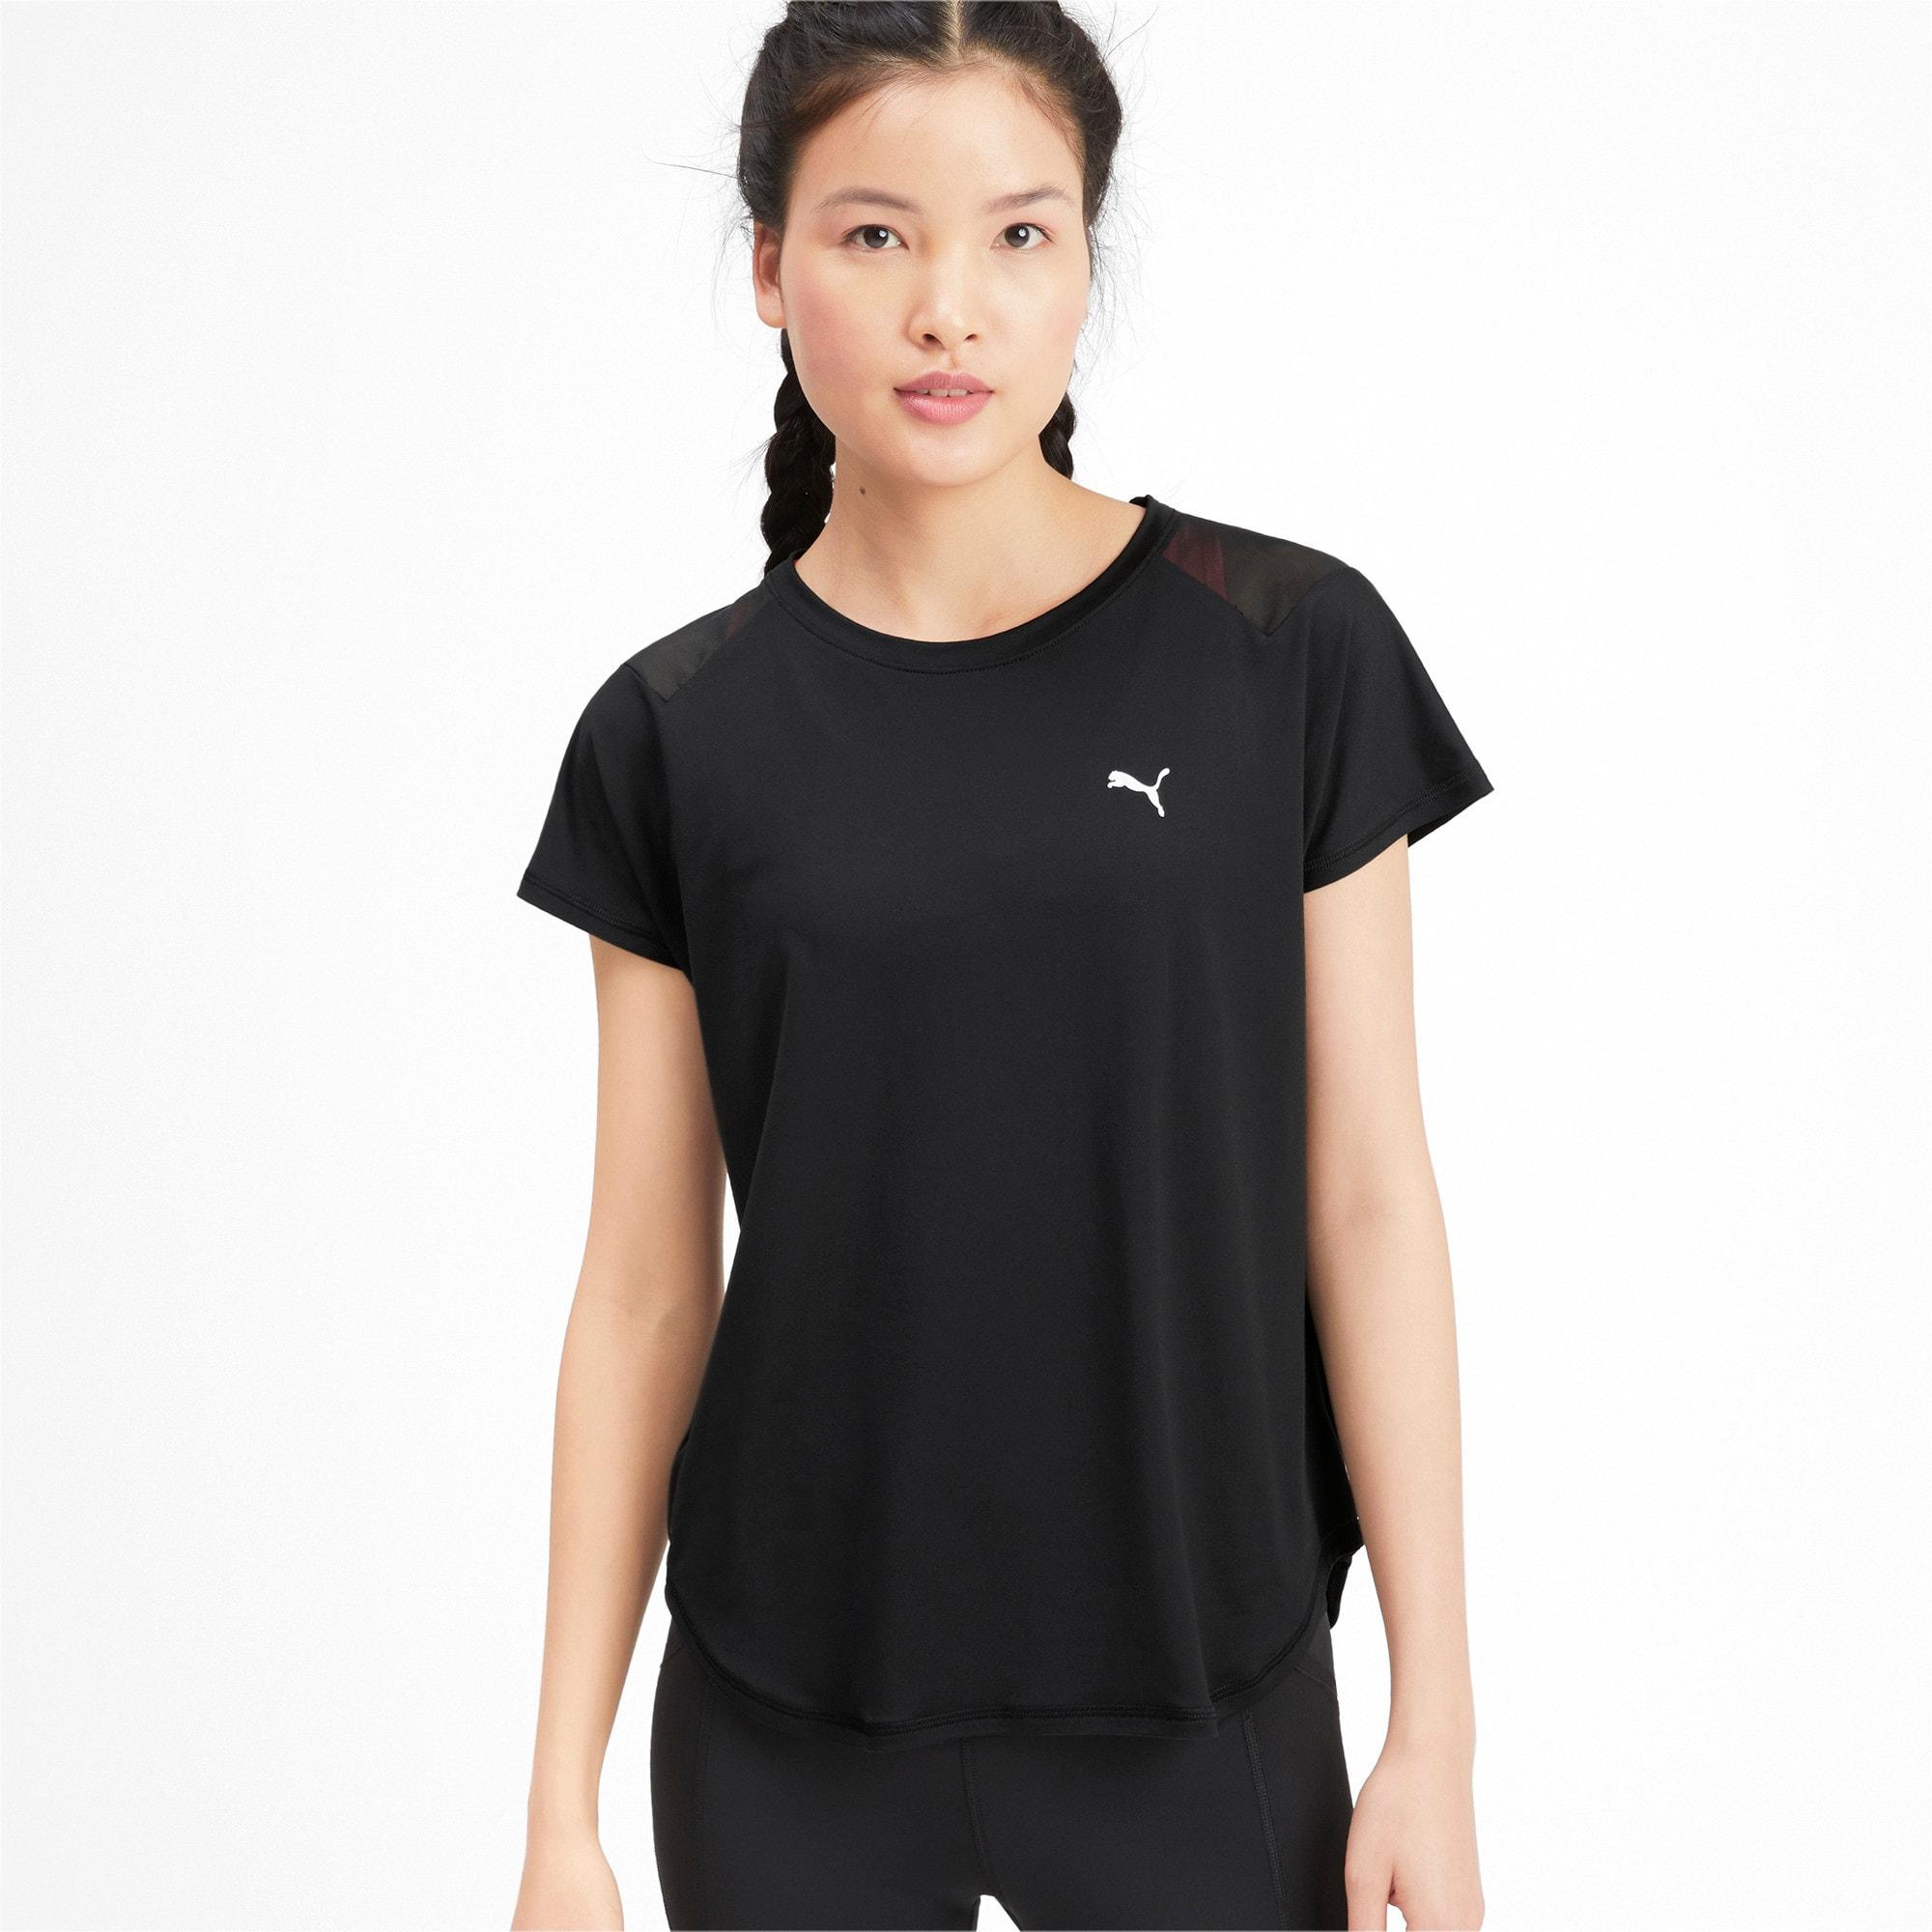 Thumbnail 1 of スタジオ SS メッシュ ウィメンズ トレーニング Tシャツ 半袖, Puma Black, medium-JPN